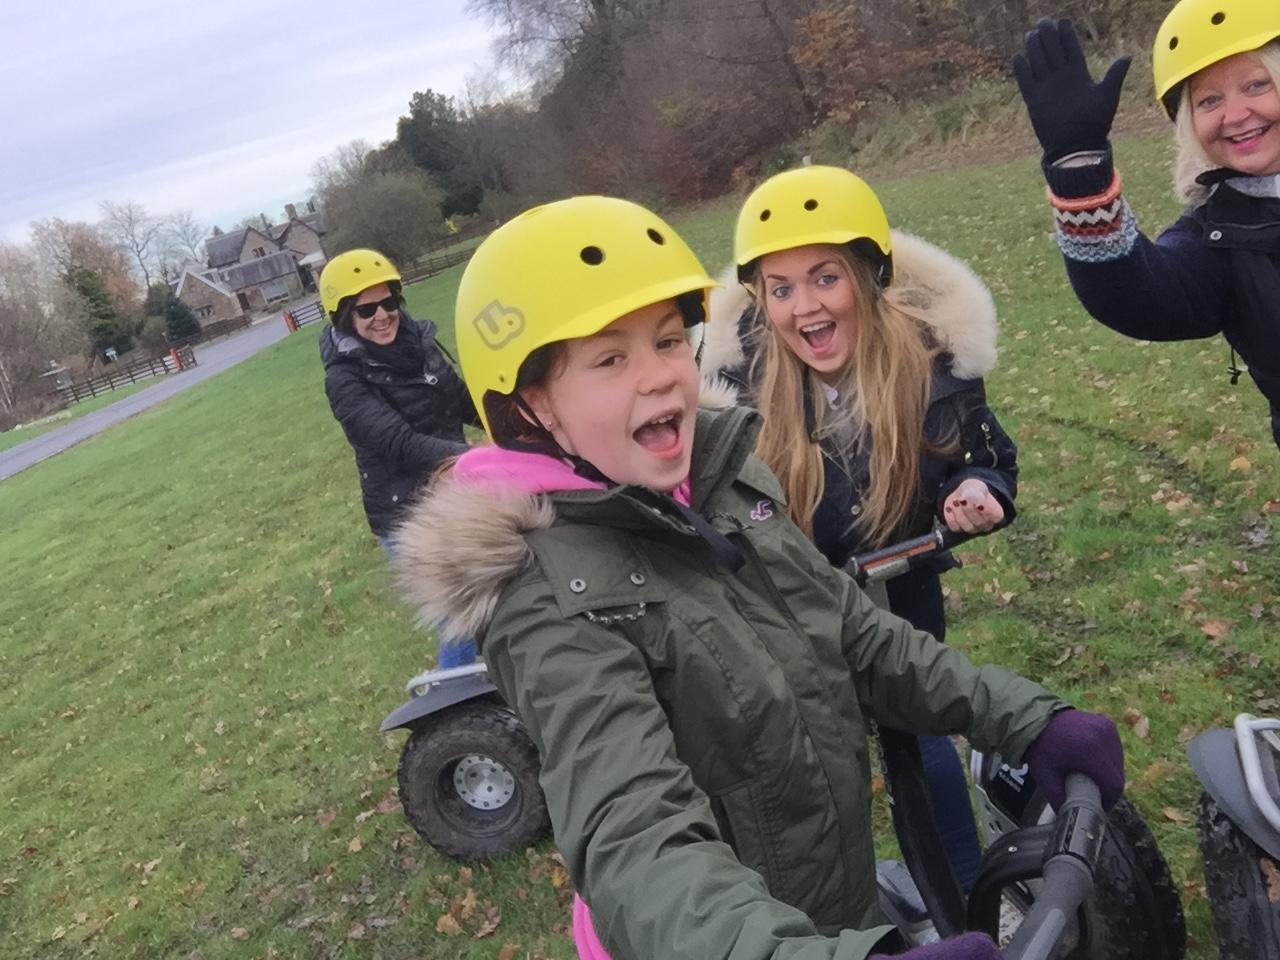 falkirk-segway-safari-wheel-scotland-weekend-away-elle-blonde-luxury-lifestyle-destination-blog